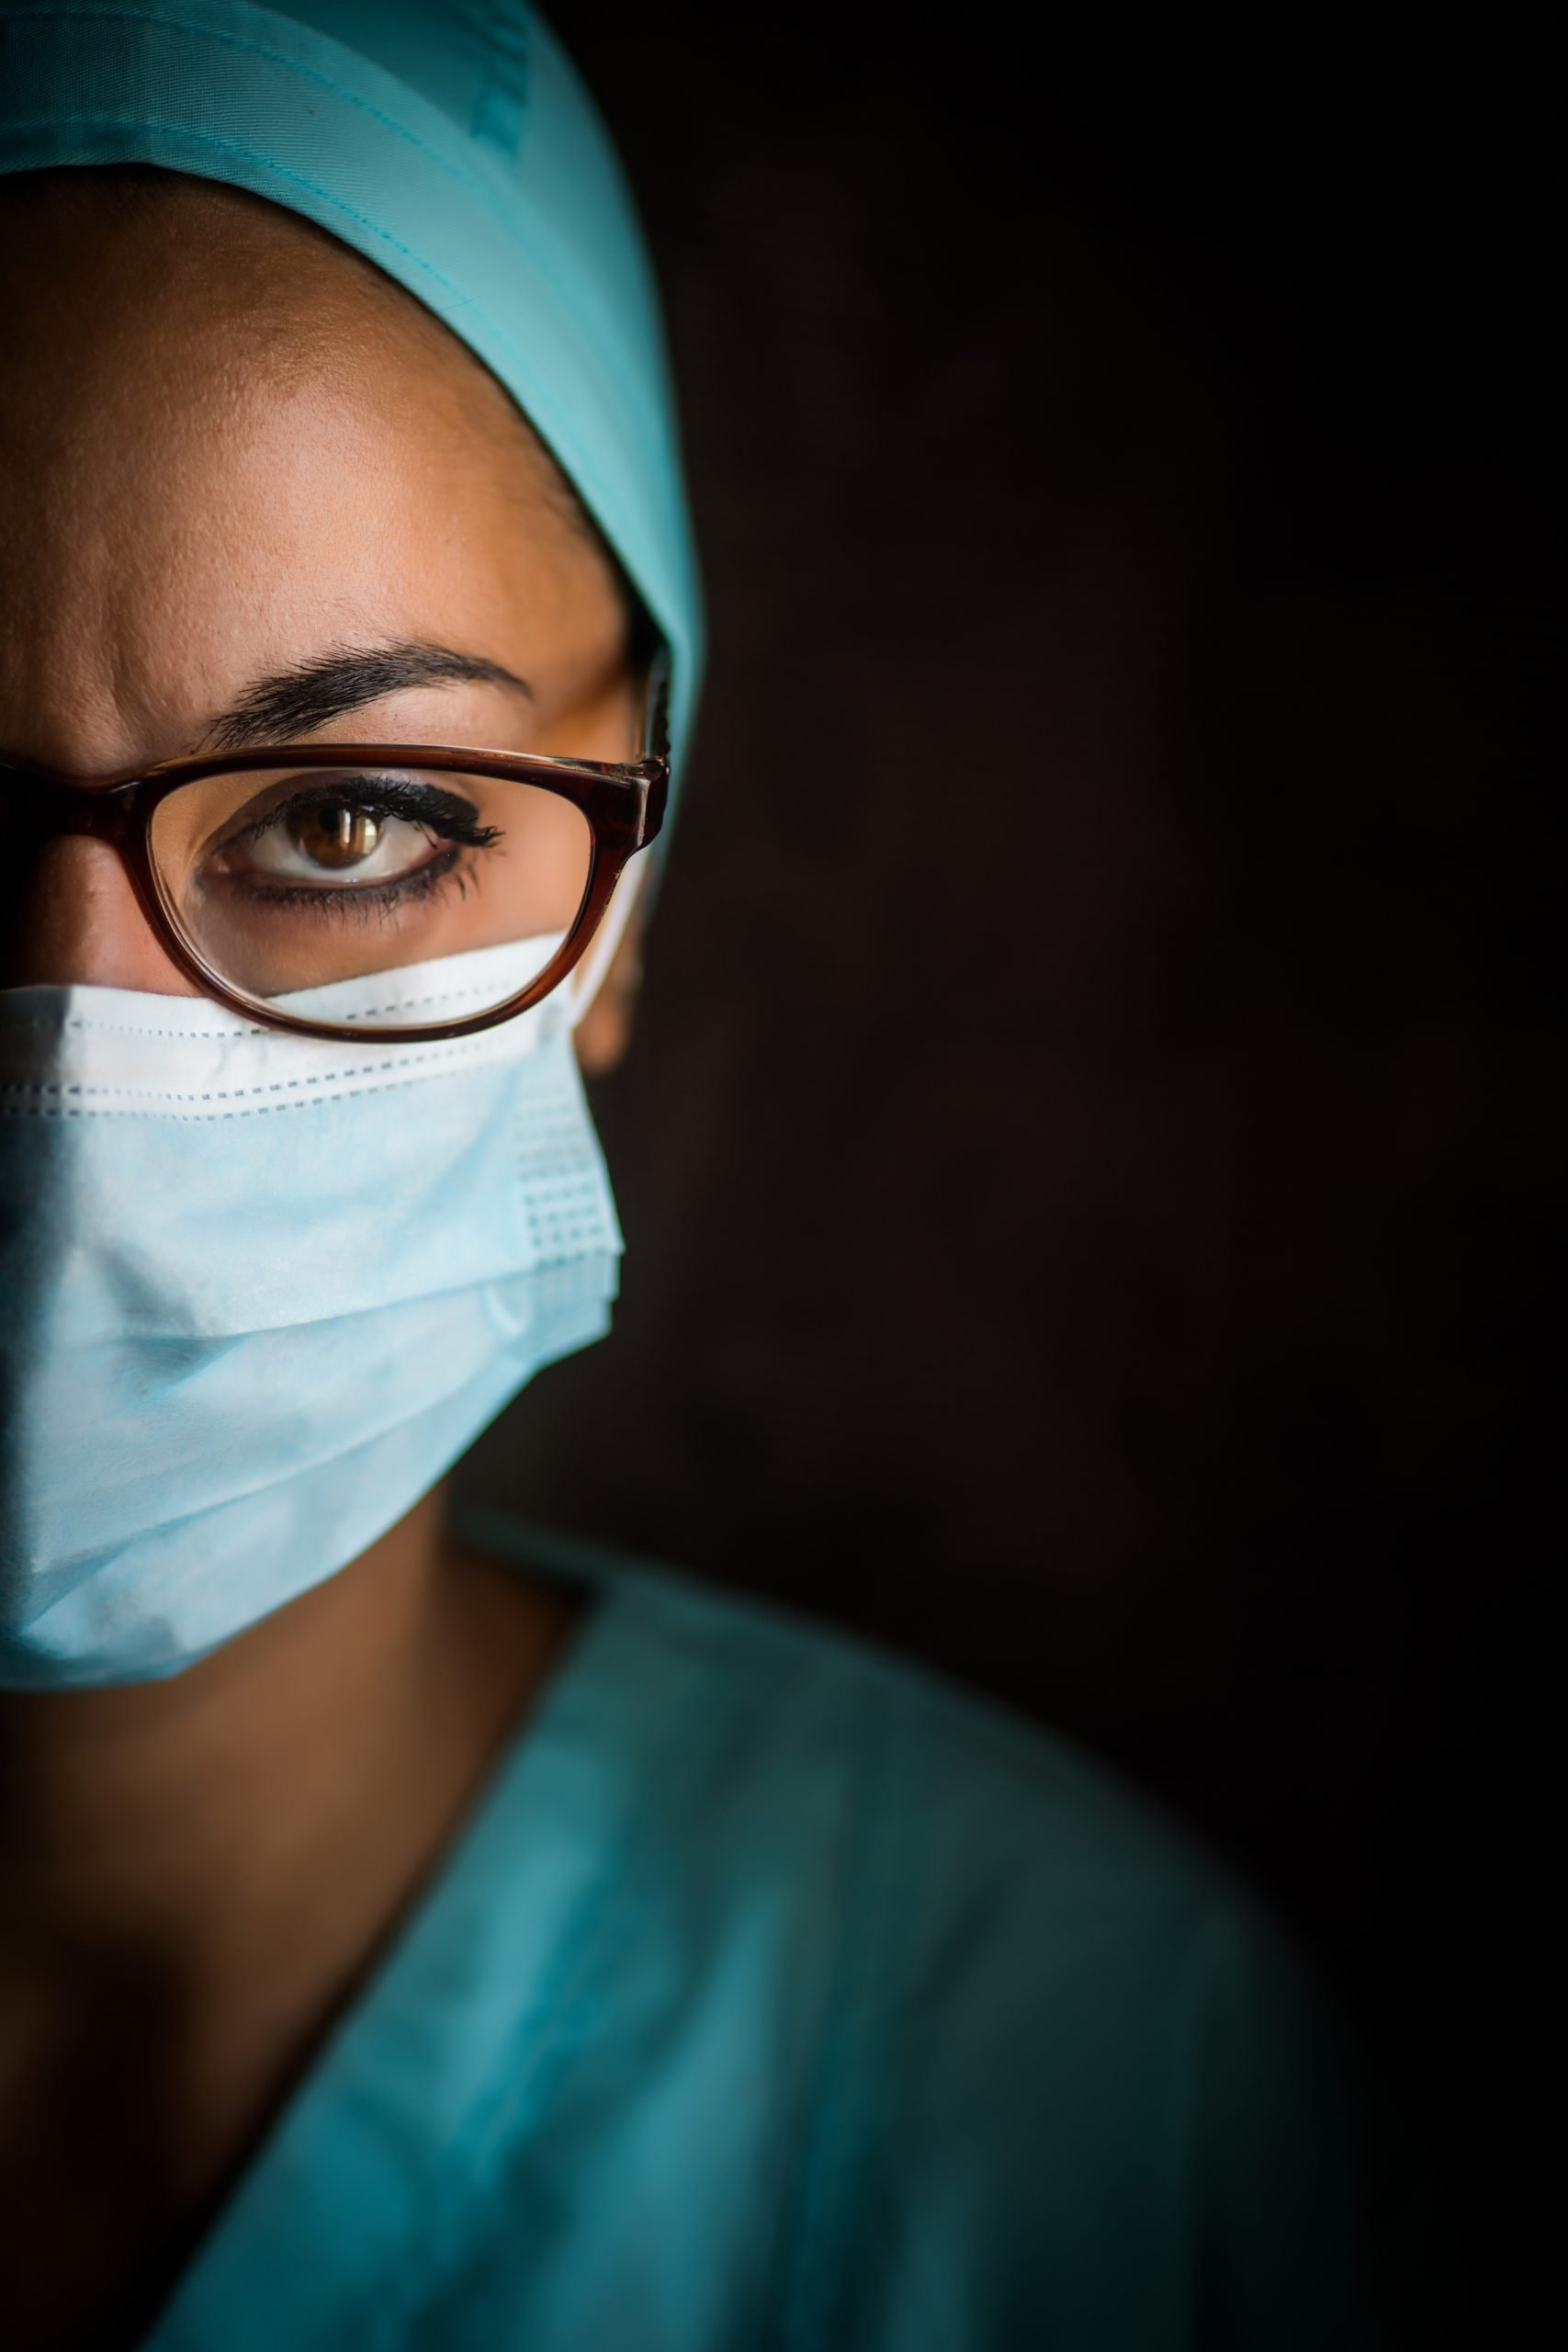 brown skinned woman in medical suit